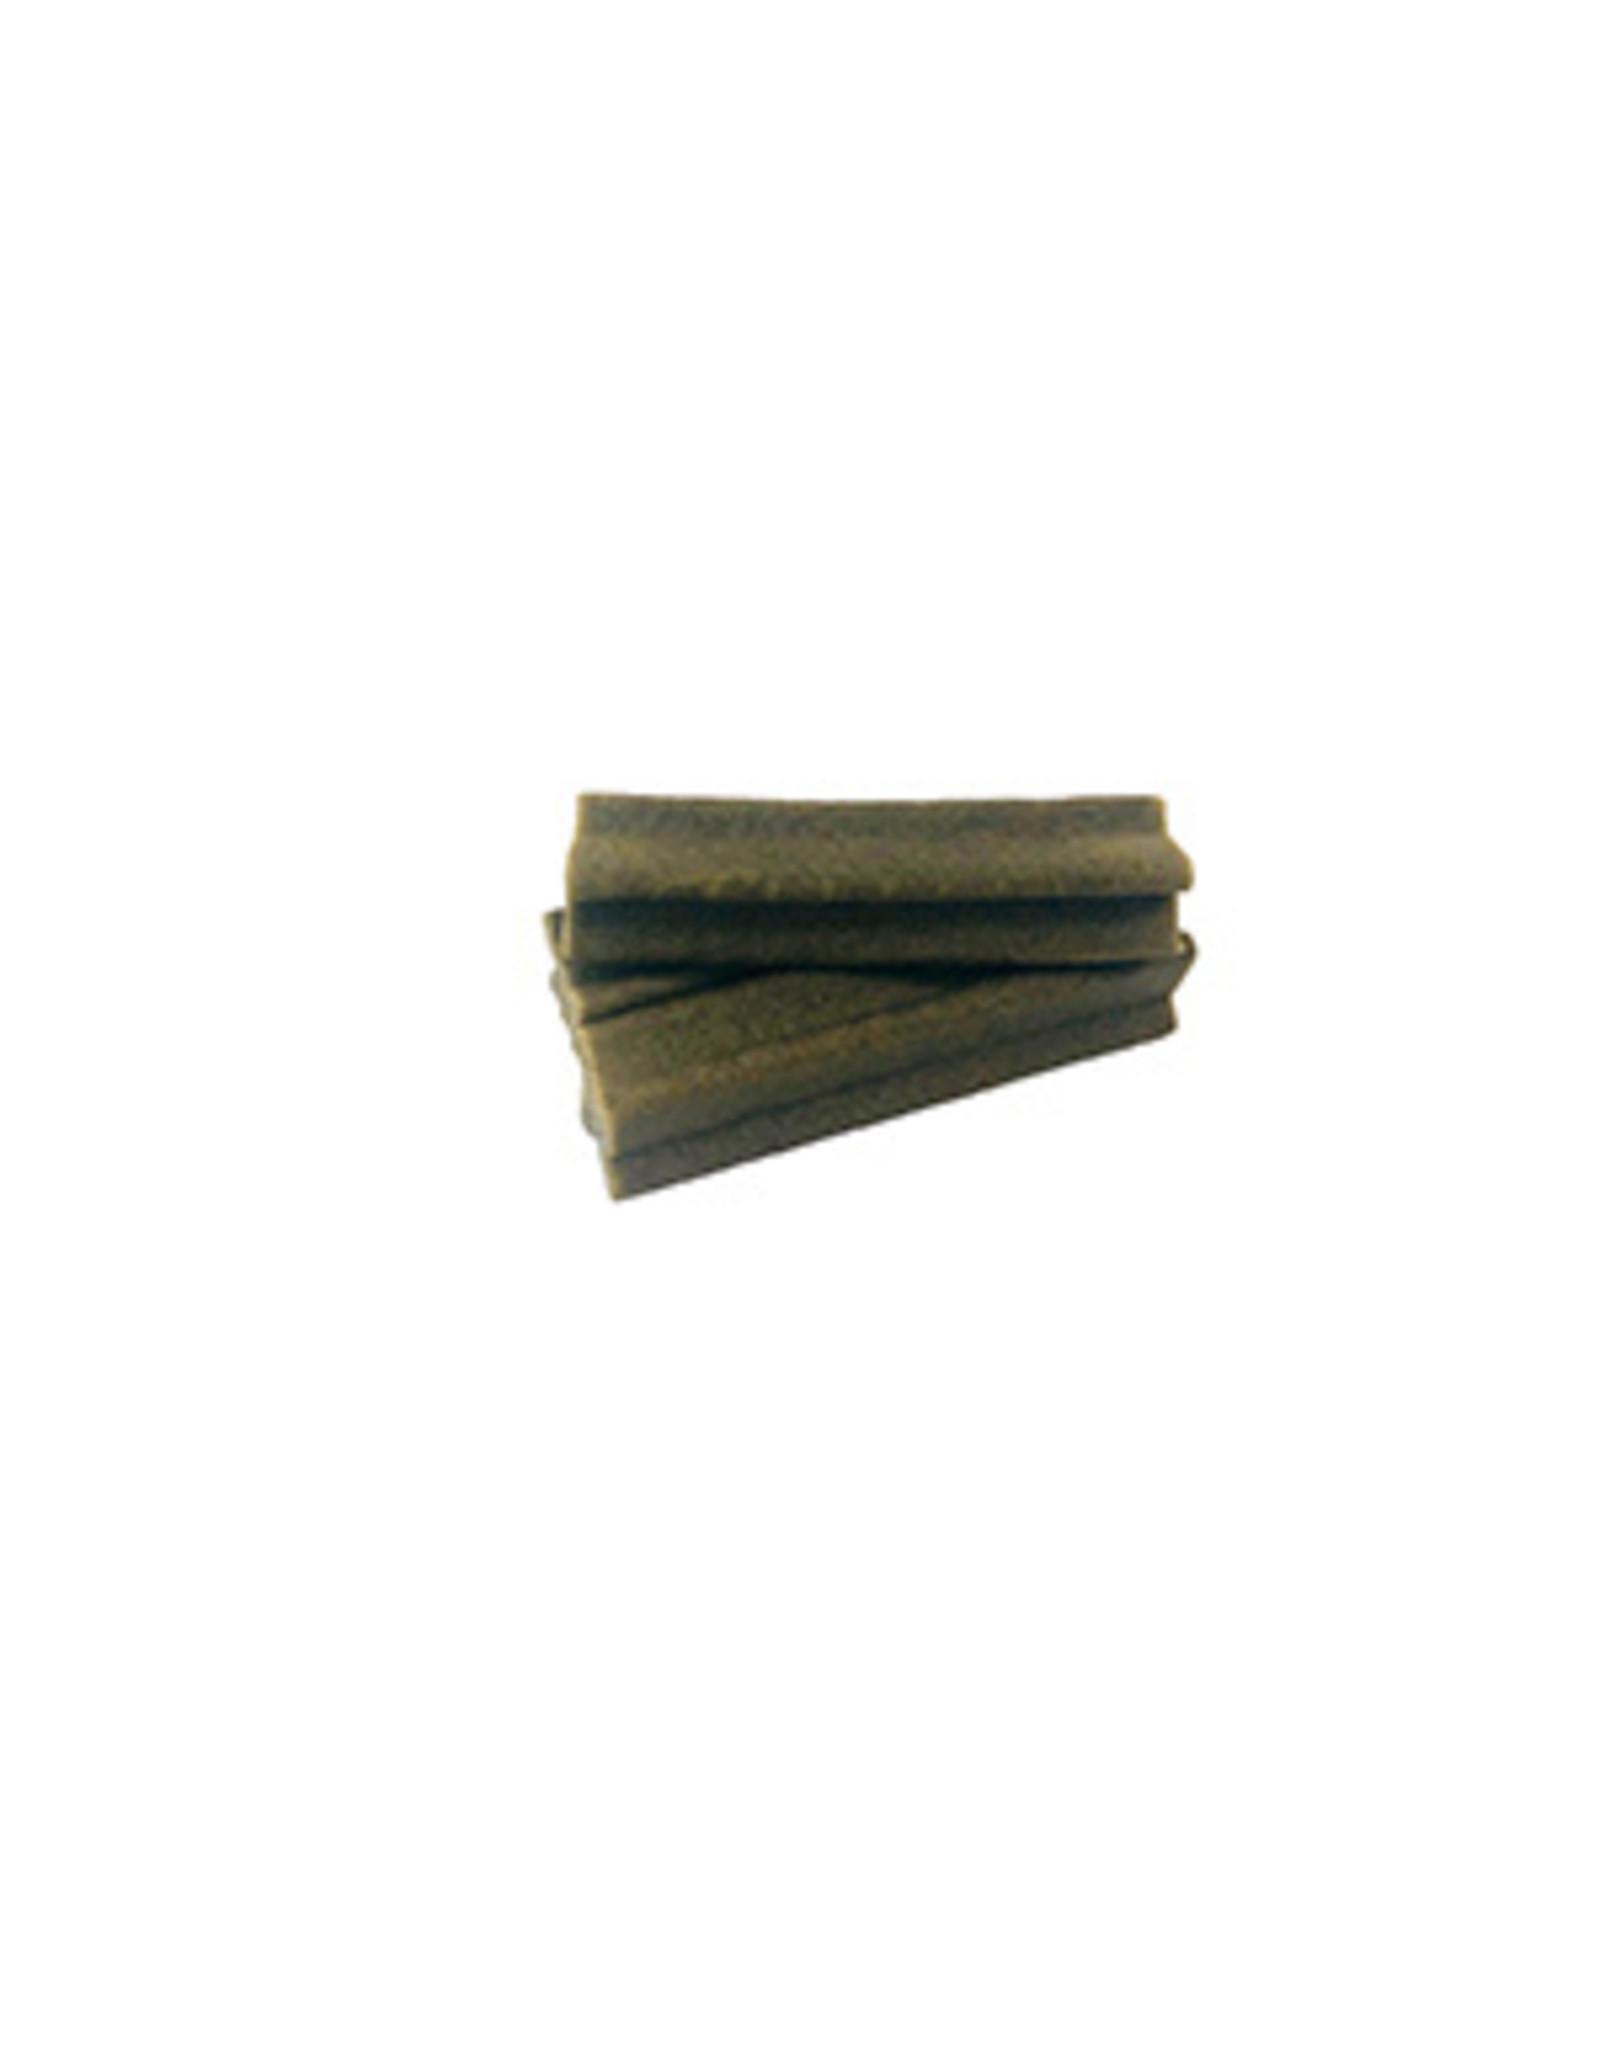 This & That Mint Fresh Breath Sticks - Small